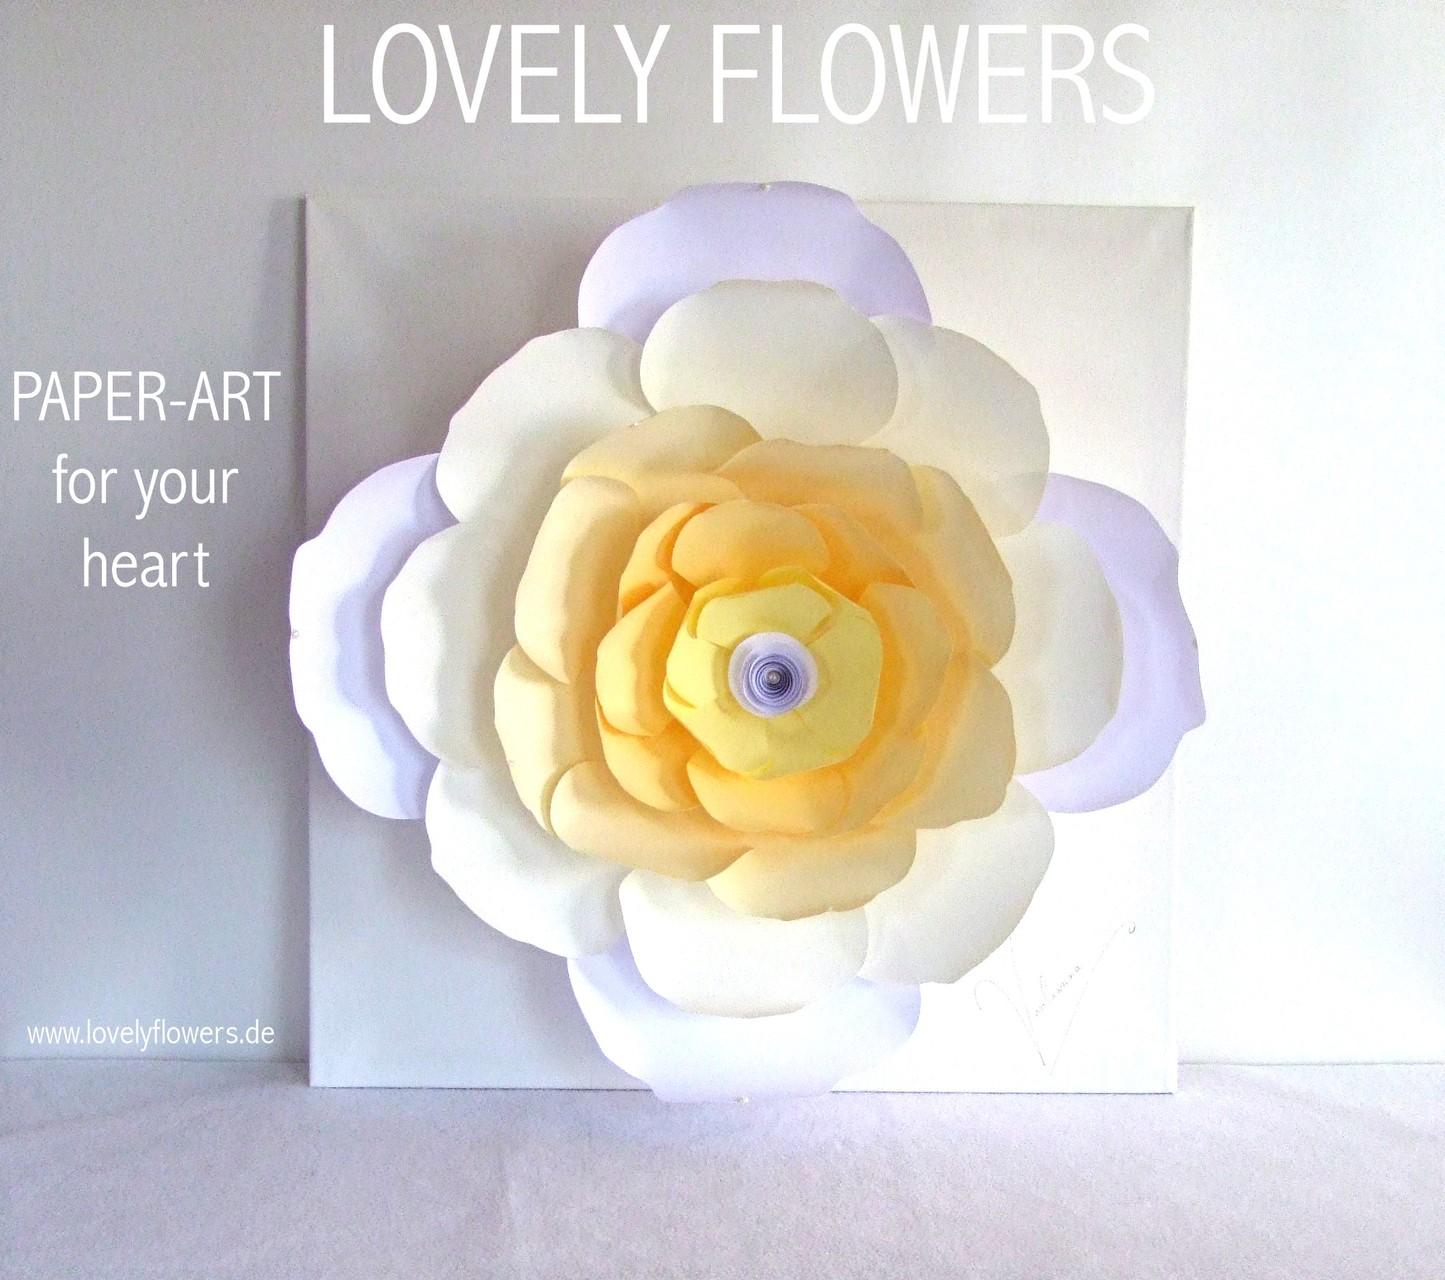 www.lovelyflowers.de - Dein Spezialist für große PAPER-ART Glücksblumenbilder!